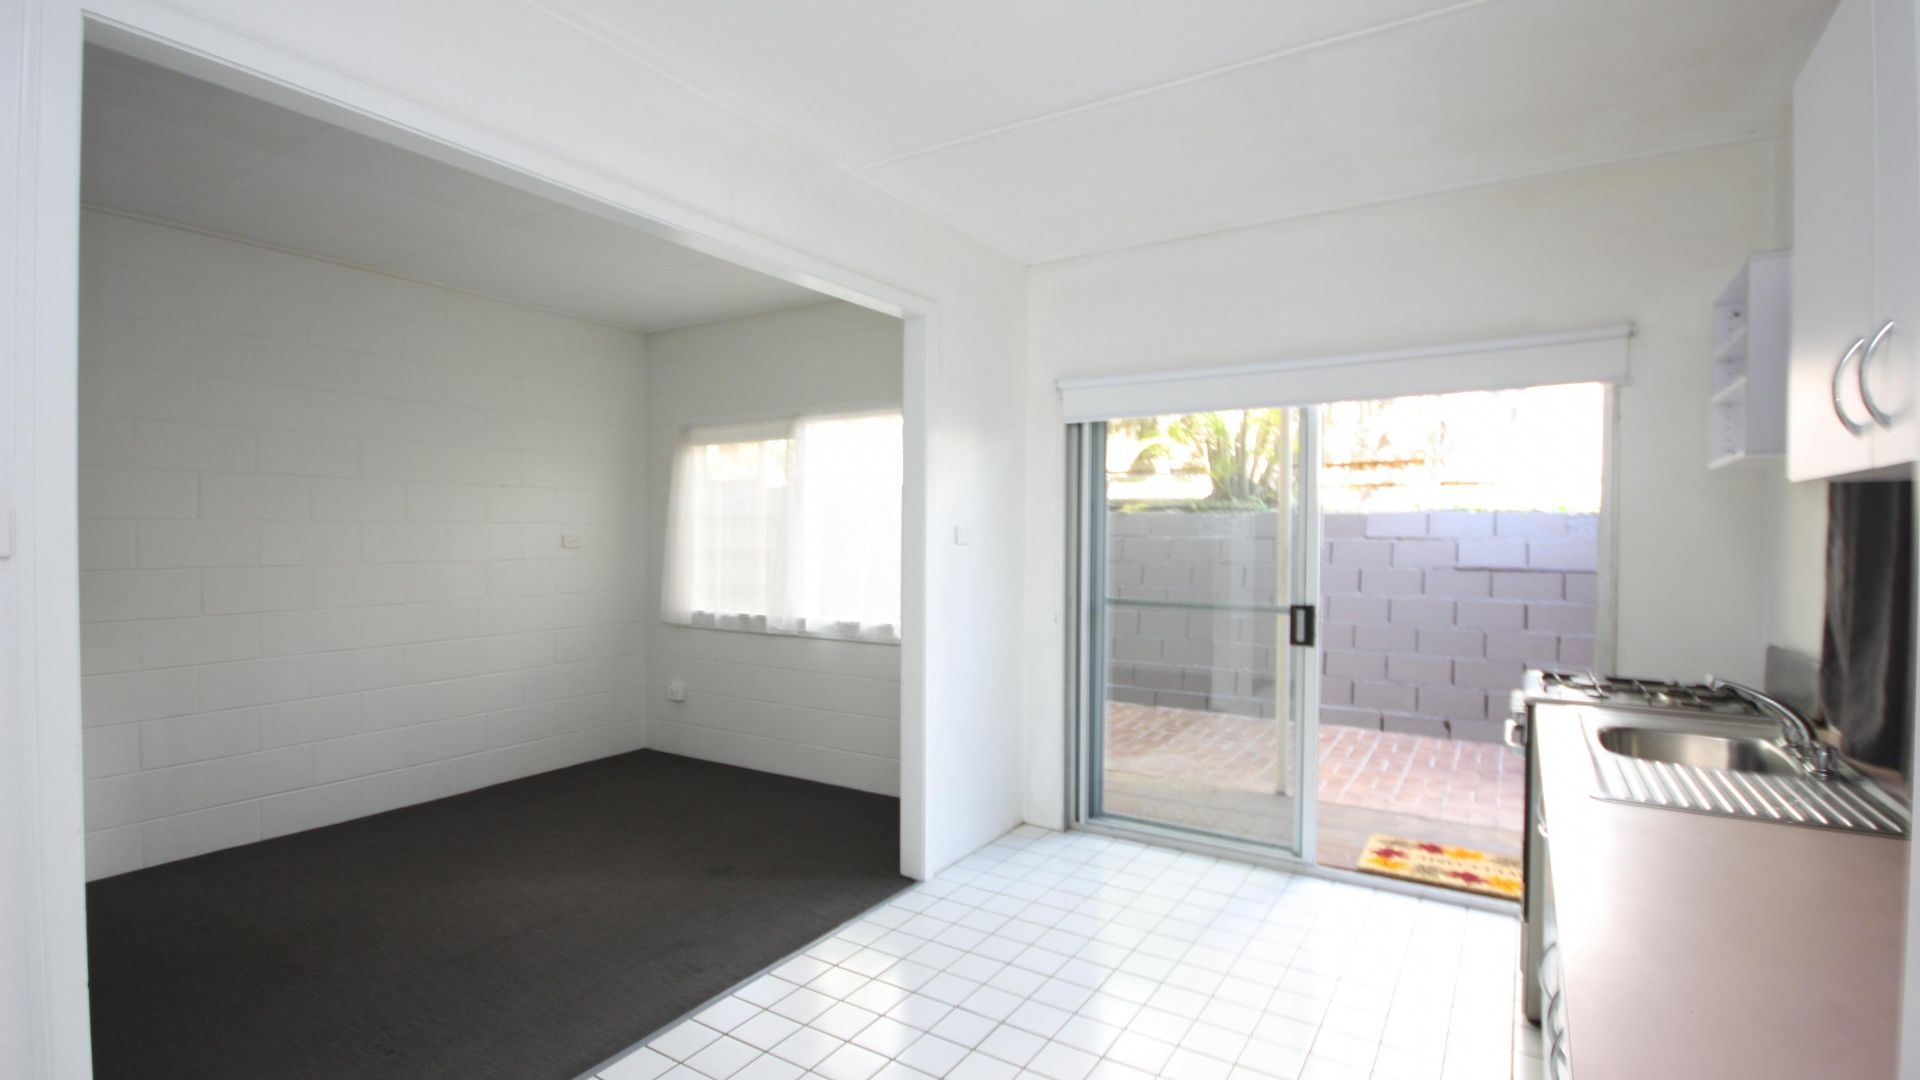 2/28 Riddell St, Bulimba QLD 4171, Image 2